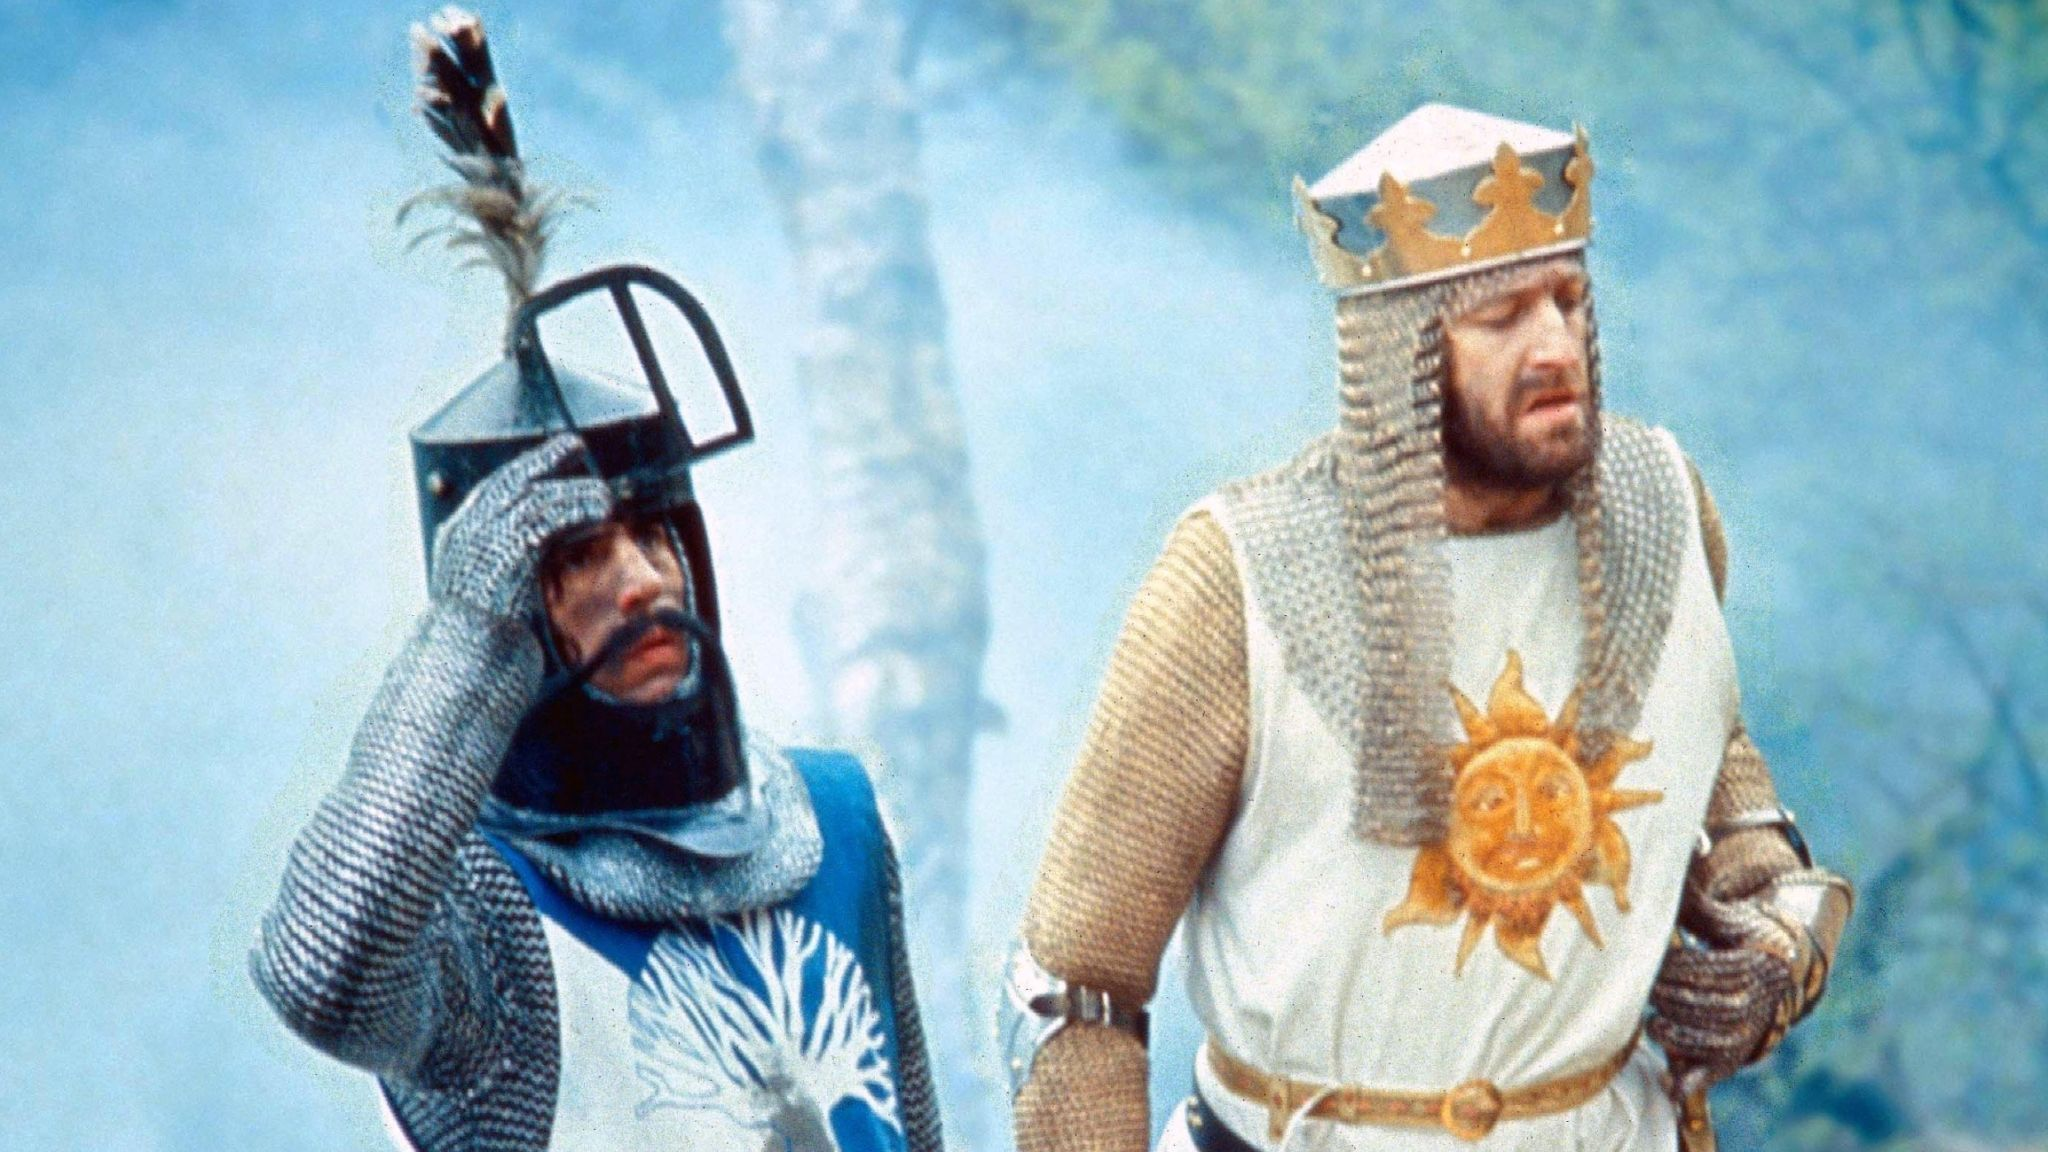 Monty Python & The Holy Grail - 1974 Terry Jones, Graham Chapman